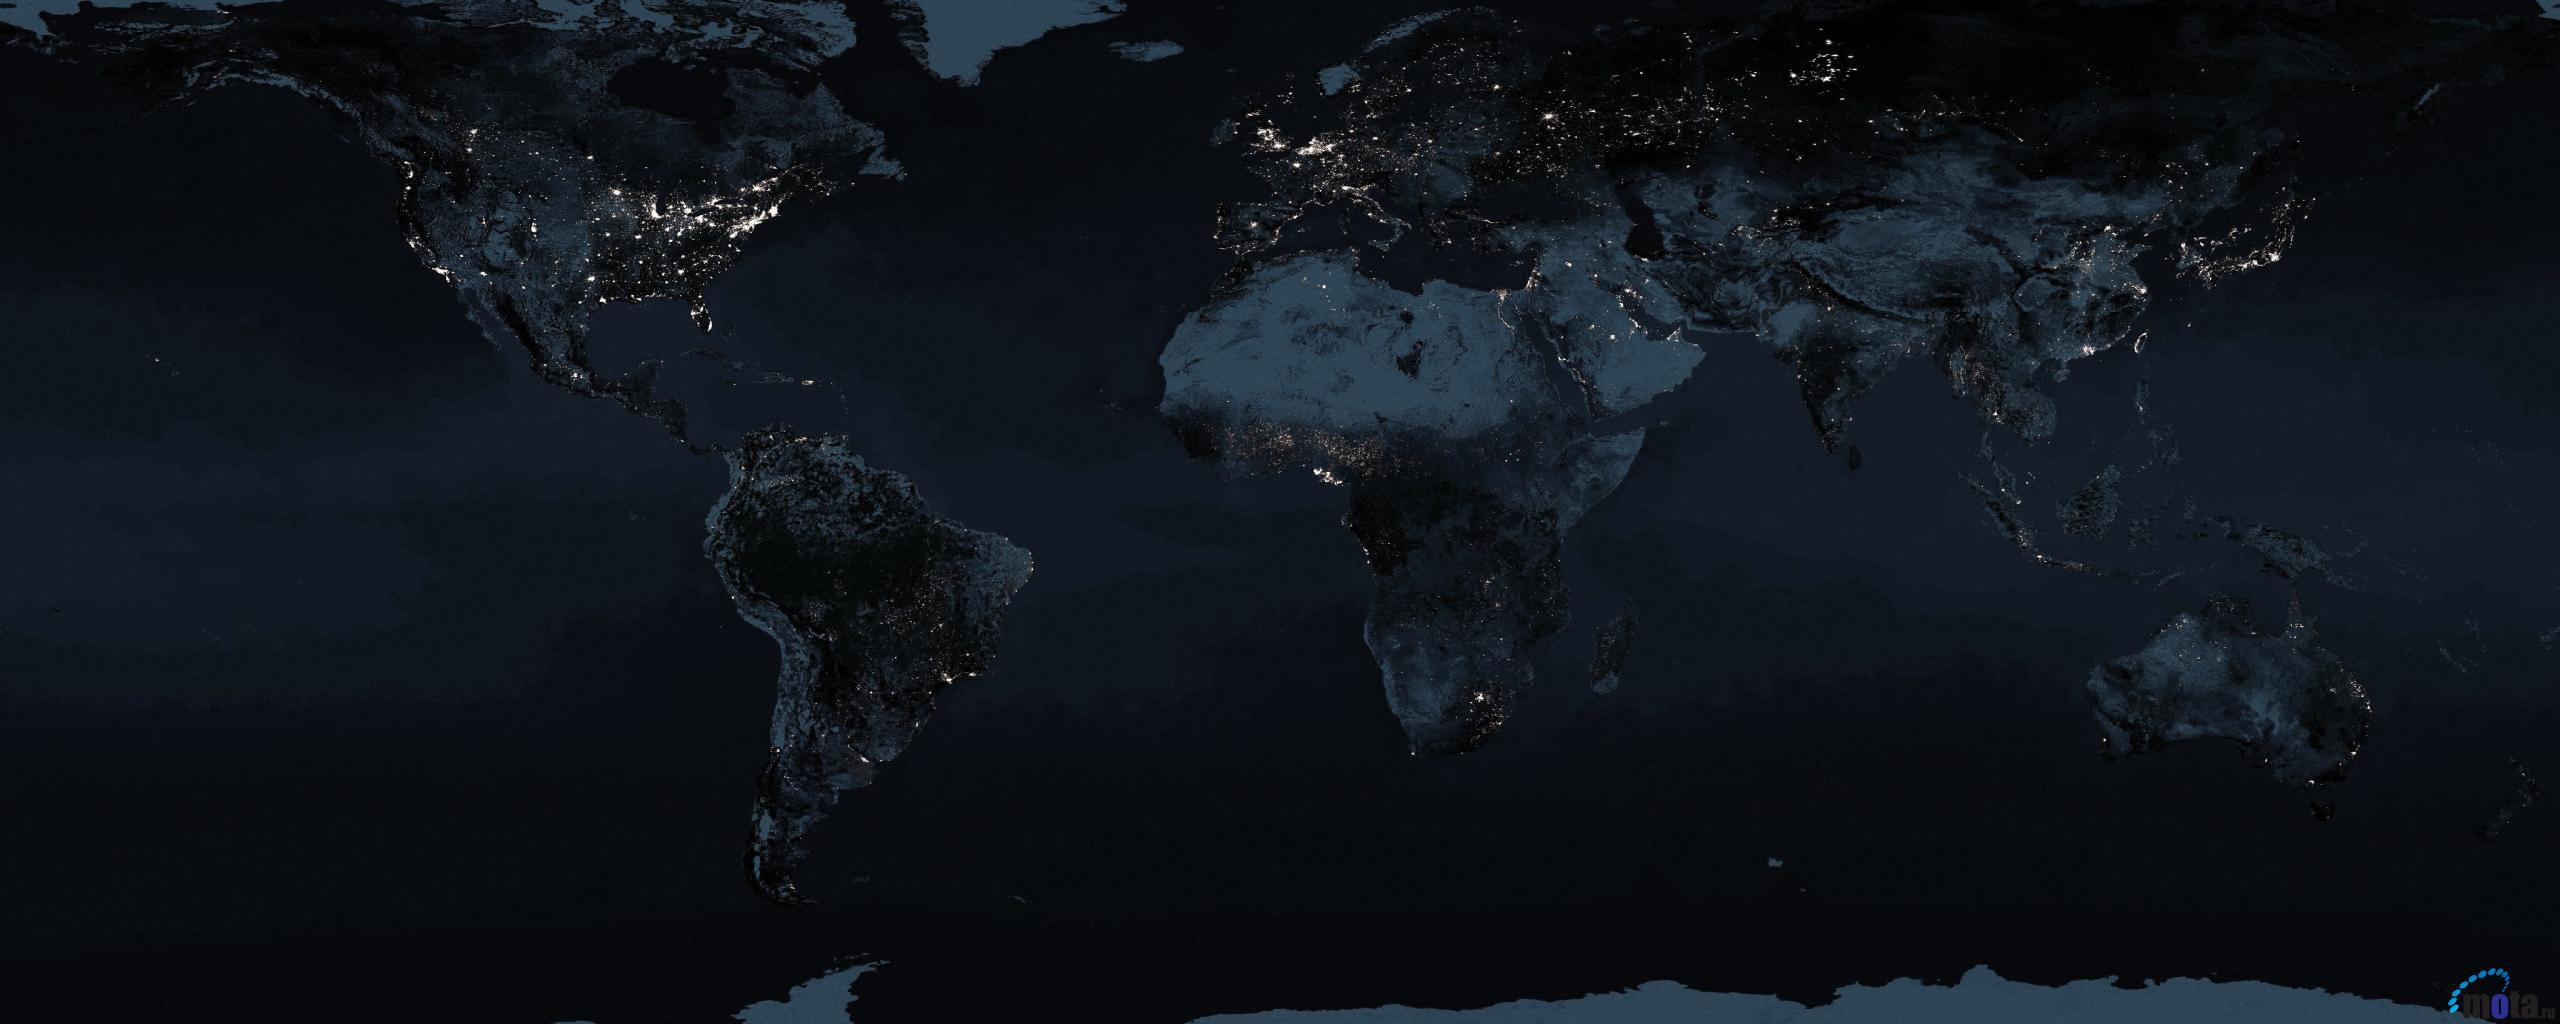 Download Wallpaper Night Earth Map 2560 x 1024 Dual Monitor Desktop 2560x1024